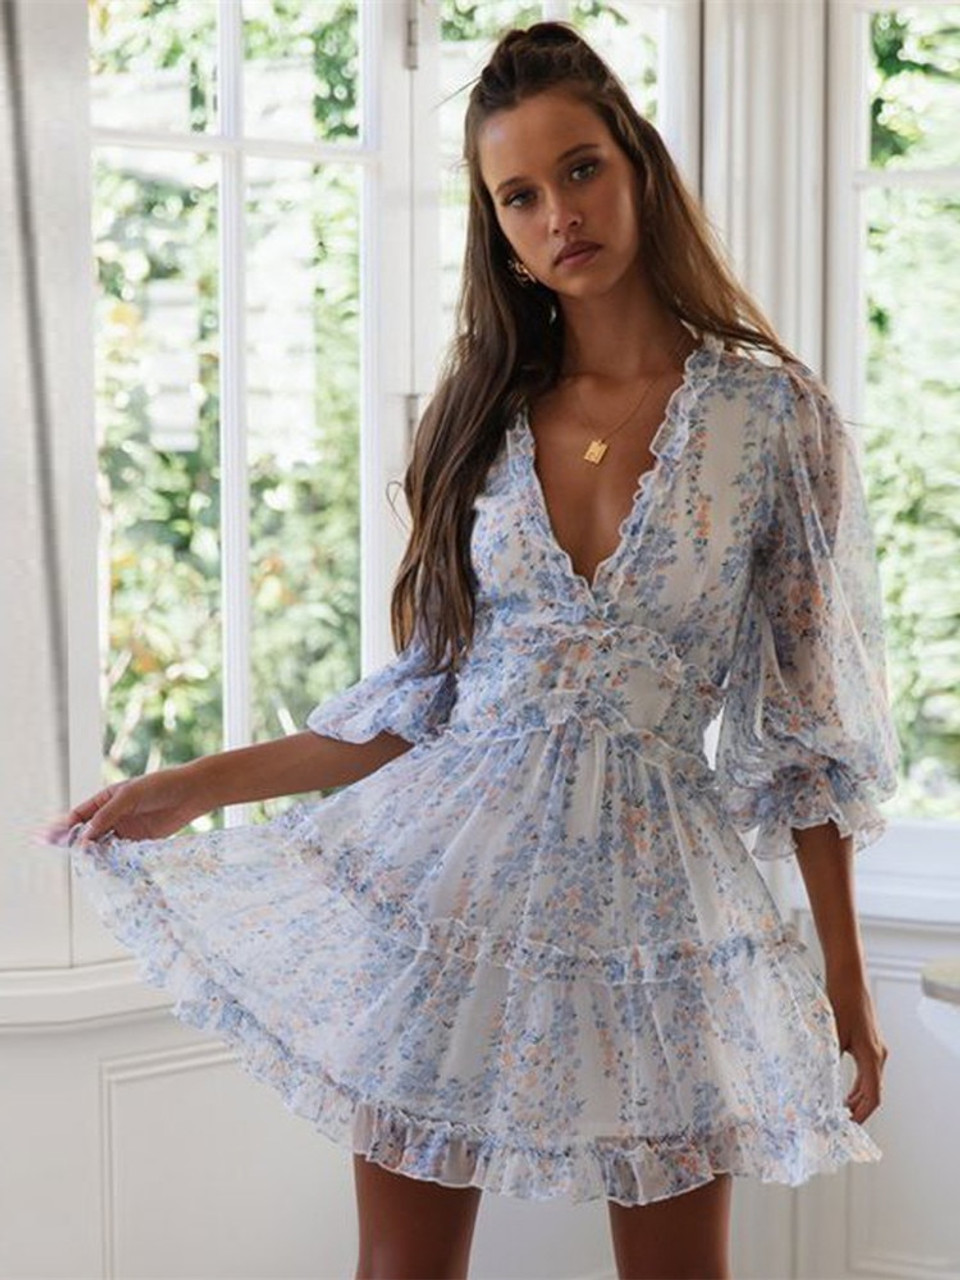 6Women Summer Sexy Deep V Long Sleeve Print Dresses Bohemian Backless  Elegant Ruffles Summer Beach Dresses DM6